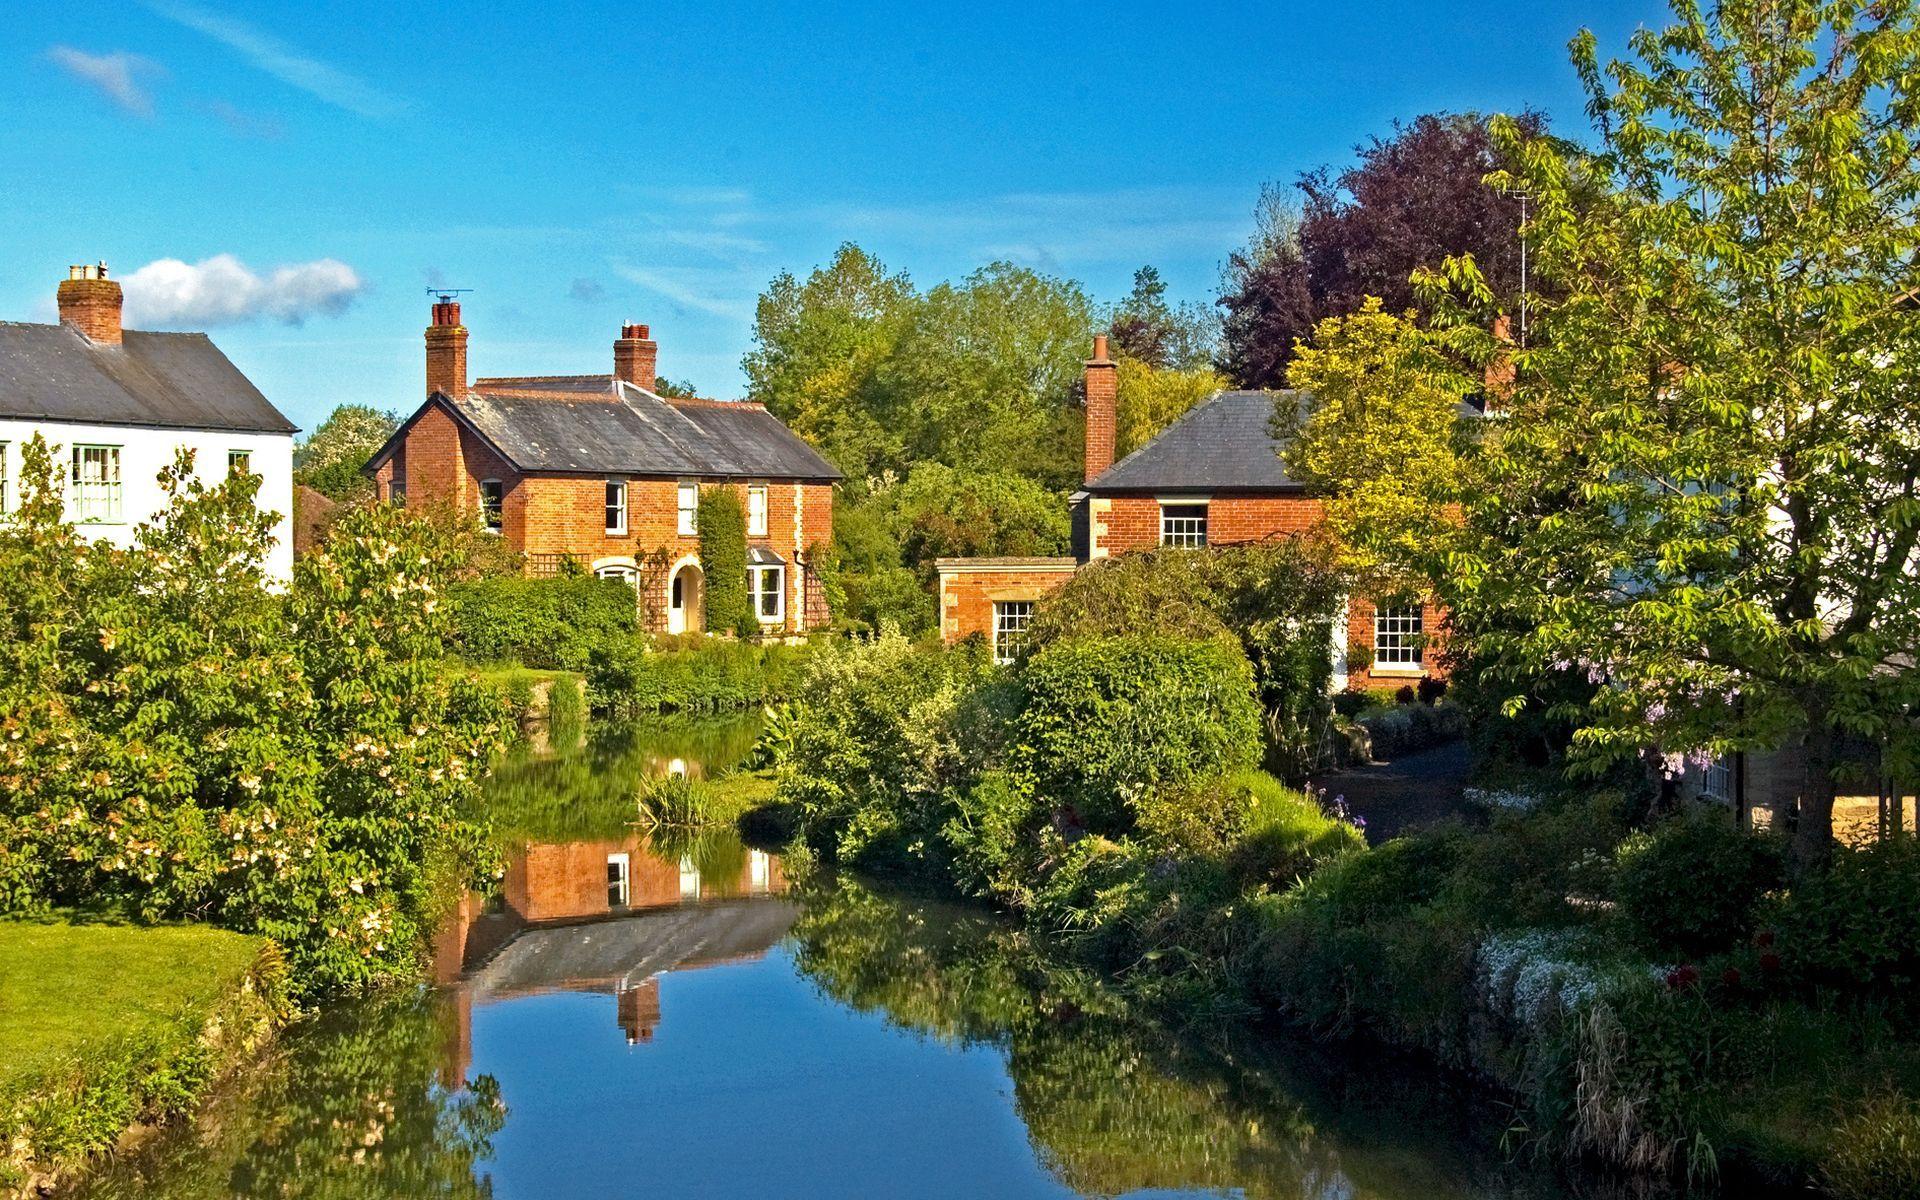 Tree England House River 1920x1200